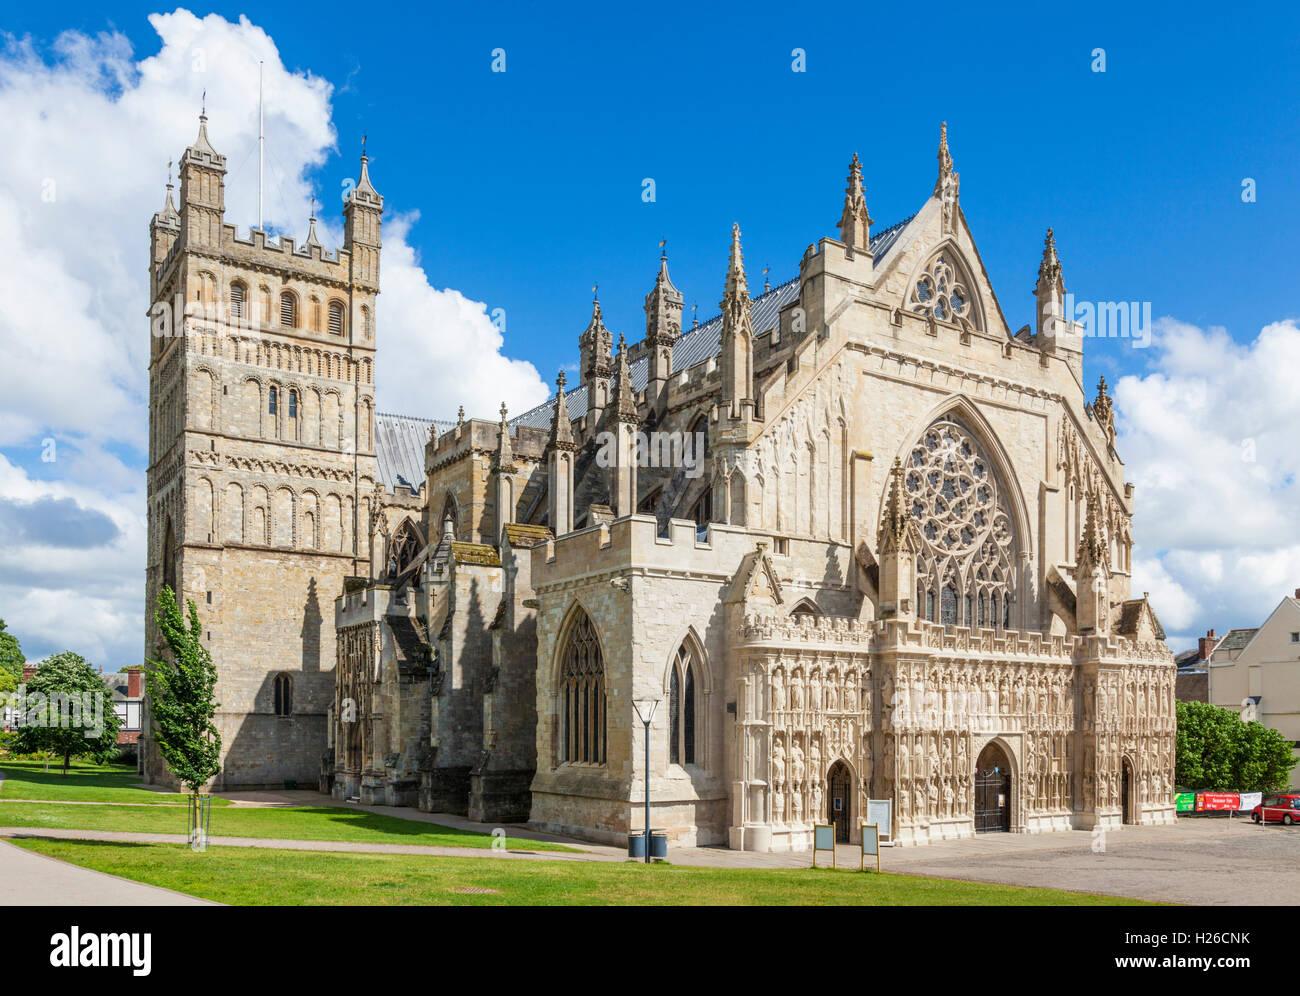 Fassade der Kathedrale von Exeter und Kathedrale Green Exeter Devon England UK GB Europa EU Stockbild